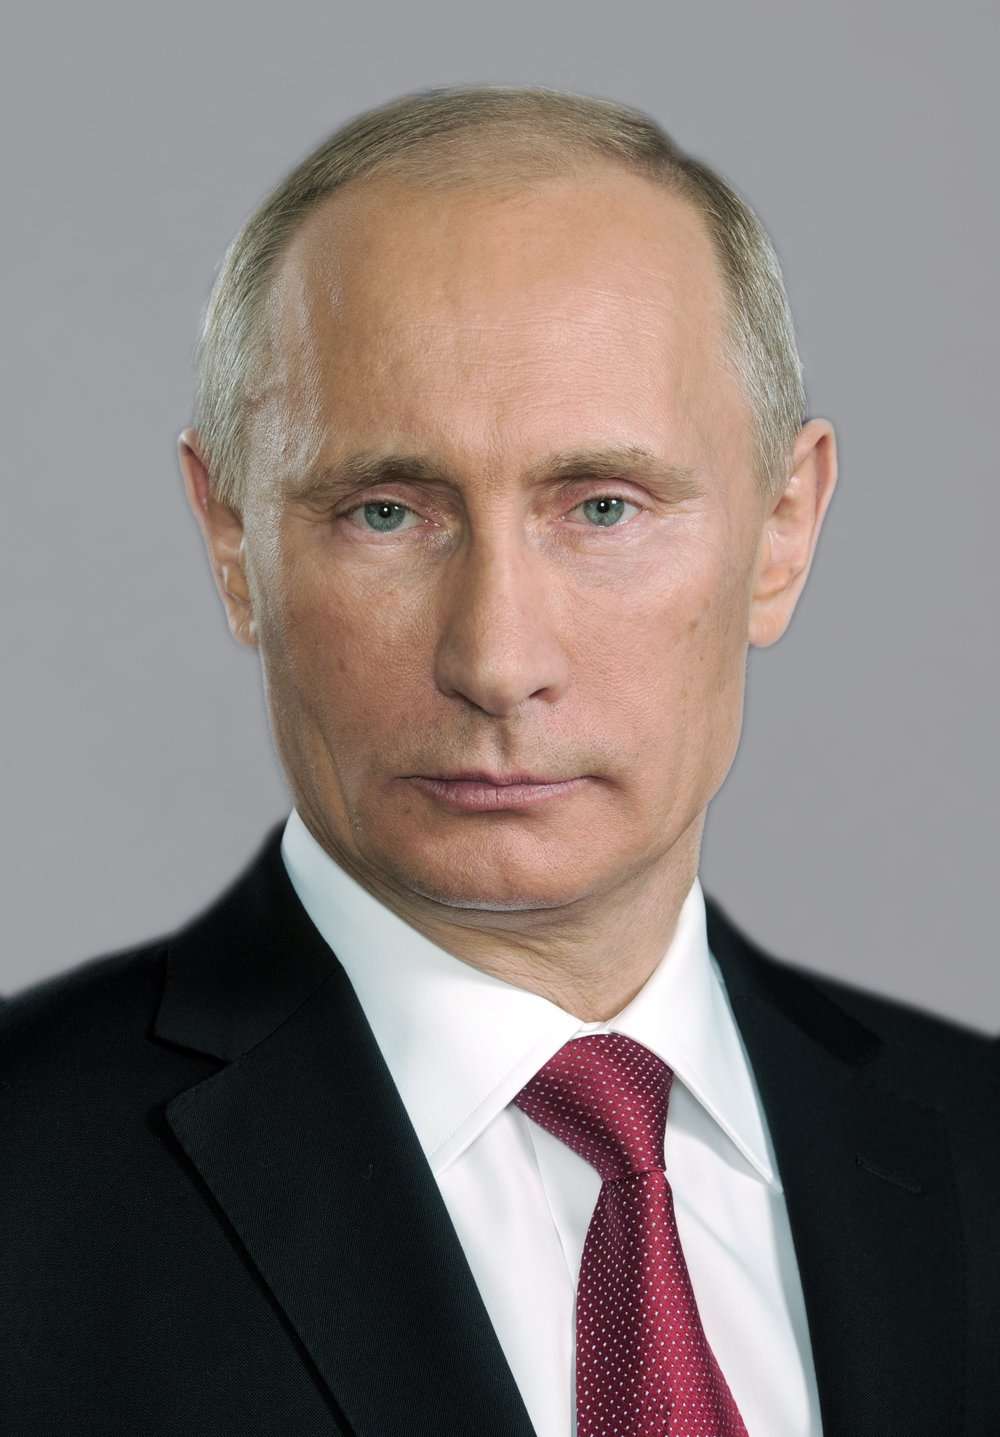 Russian President Vladimir Putin. Credit: Russian Presidential Press and Information Office.